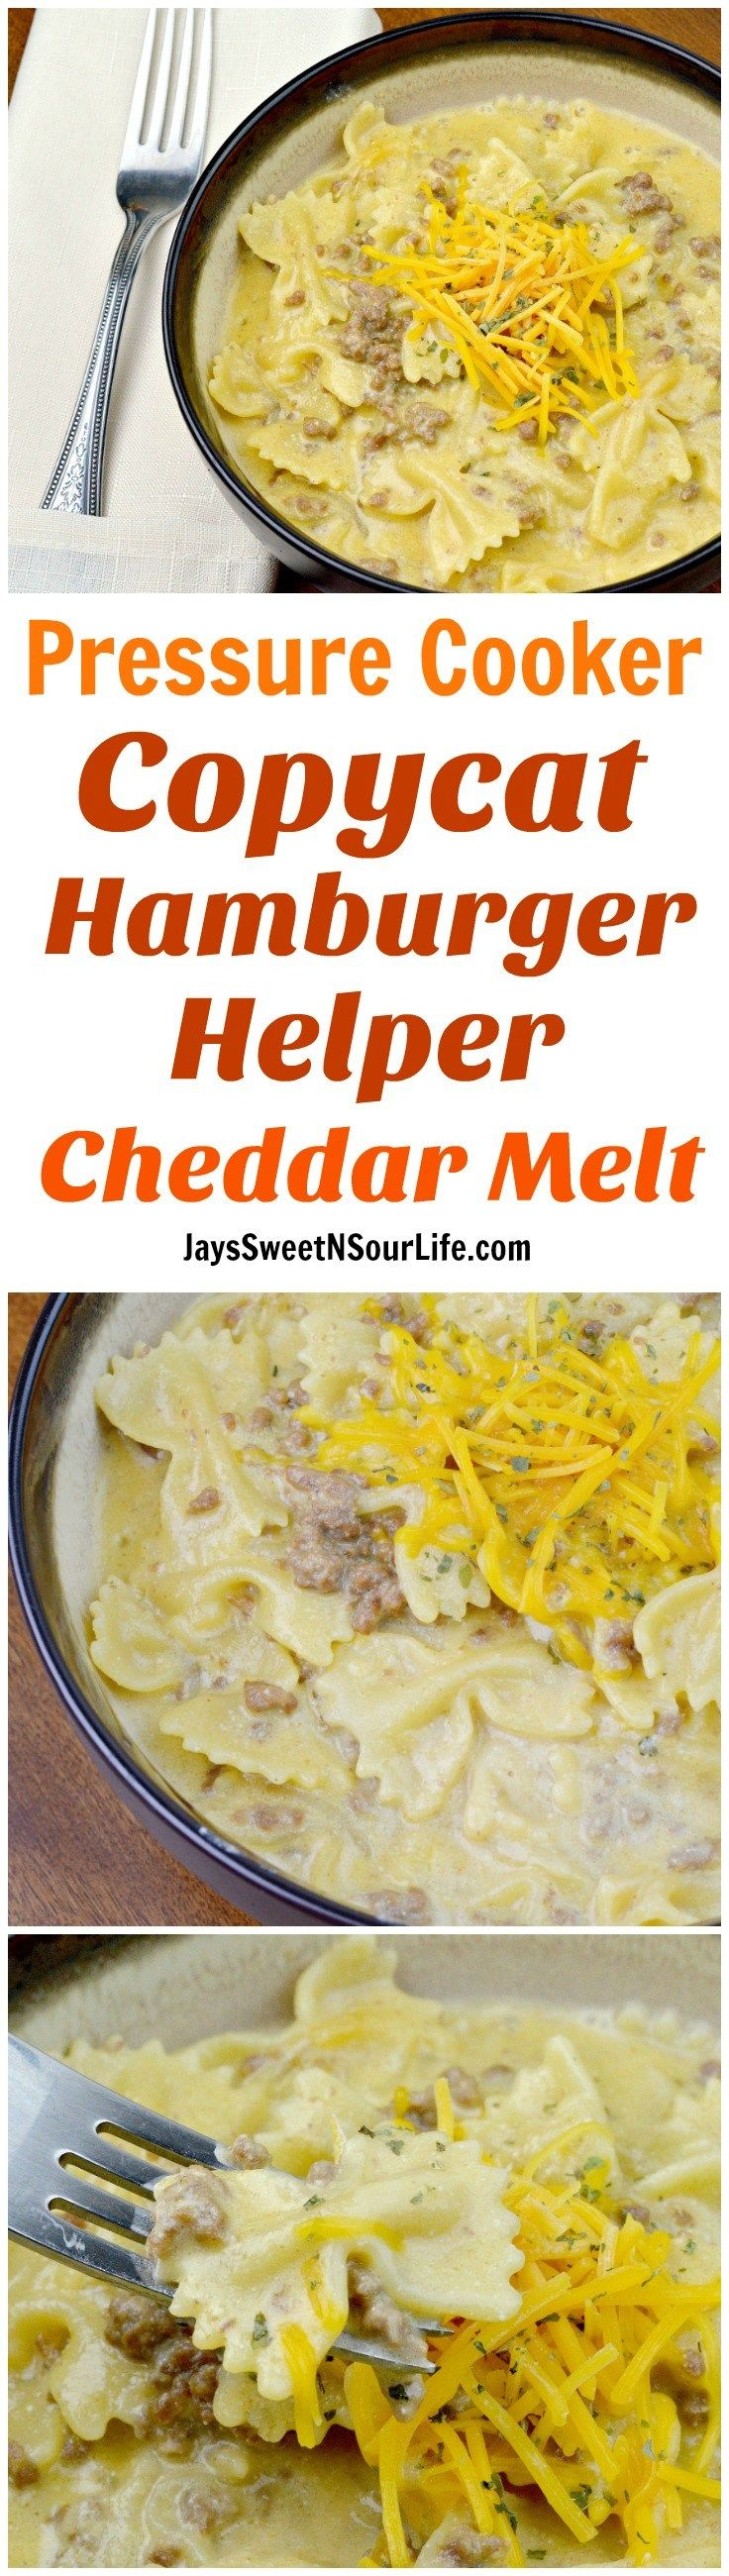 Pressure Cooker Copycat Hamburger Helper Cheddar Melt - Jay's Sweet N Sour Life Blog